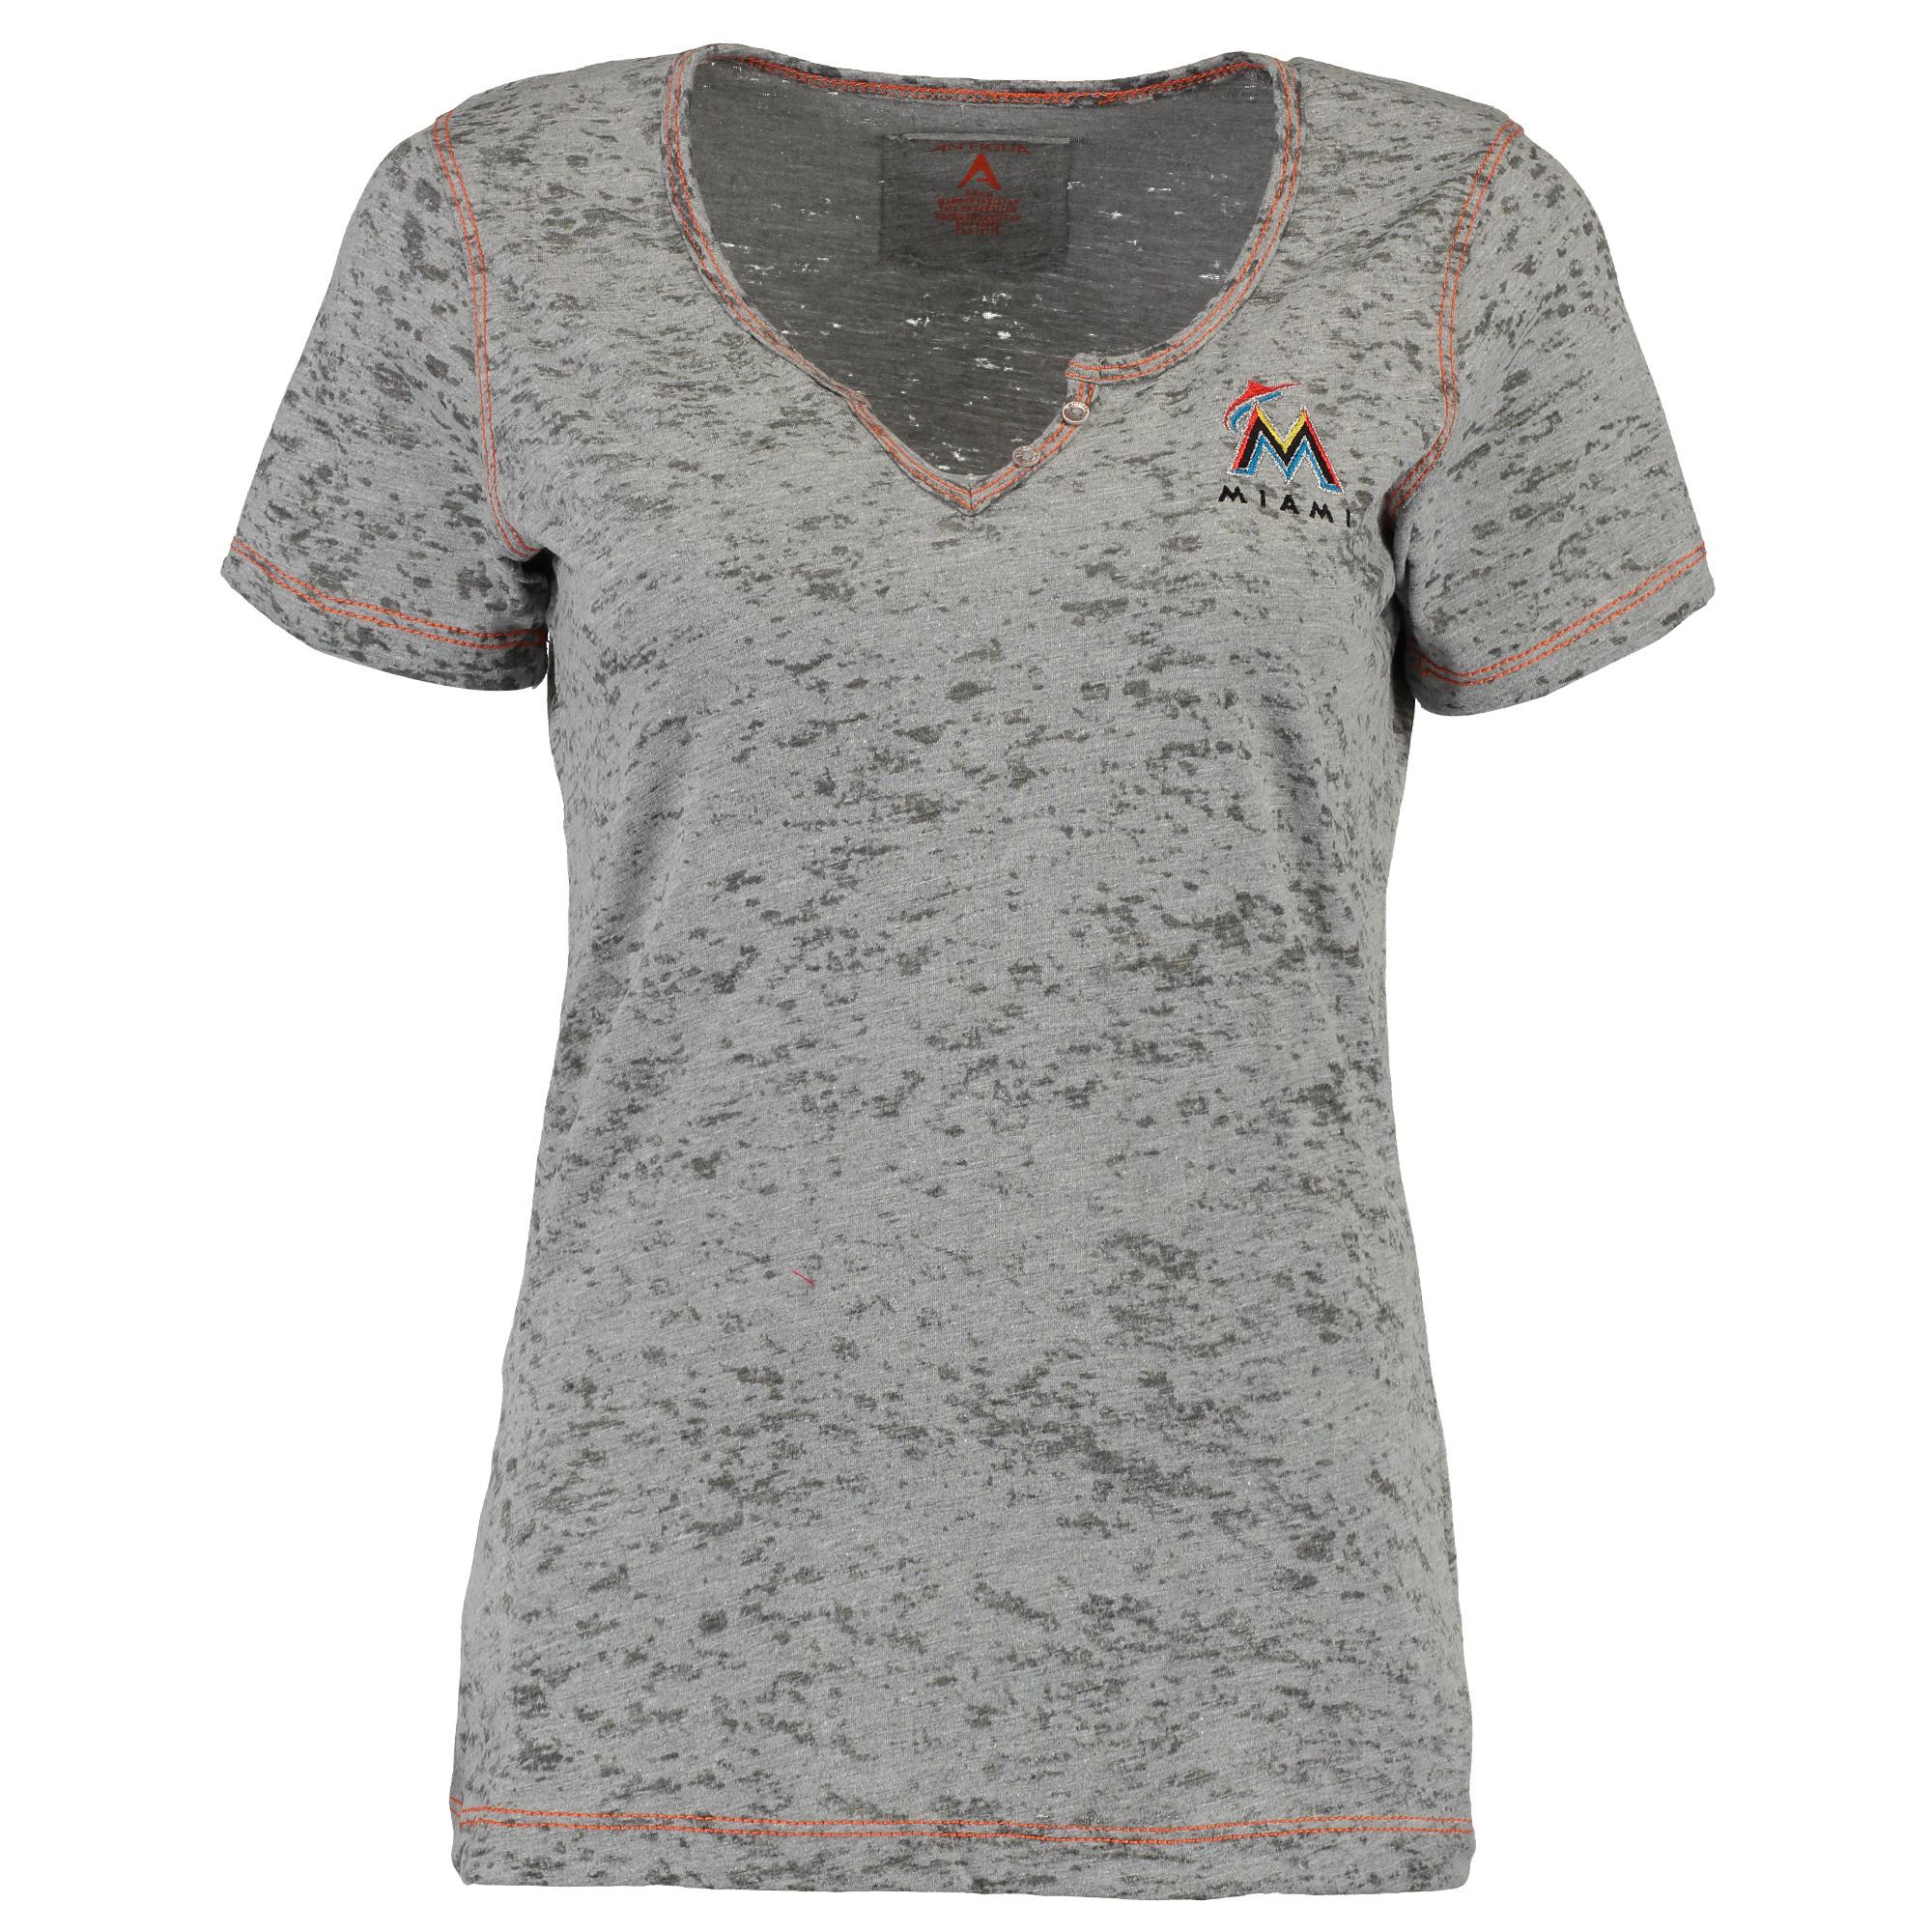 Miami Marlins Antigua Women's Rowdy T-Shirt - Gray